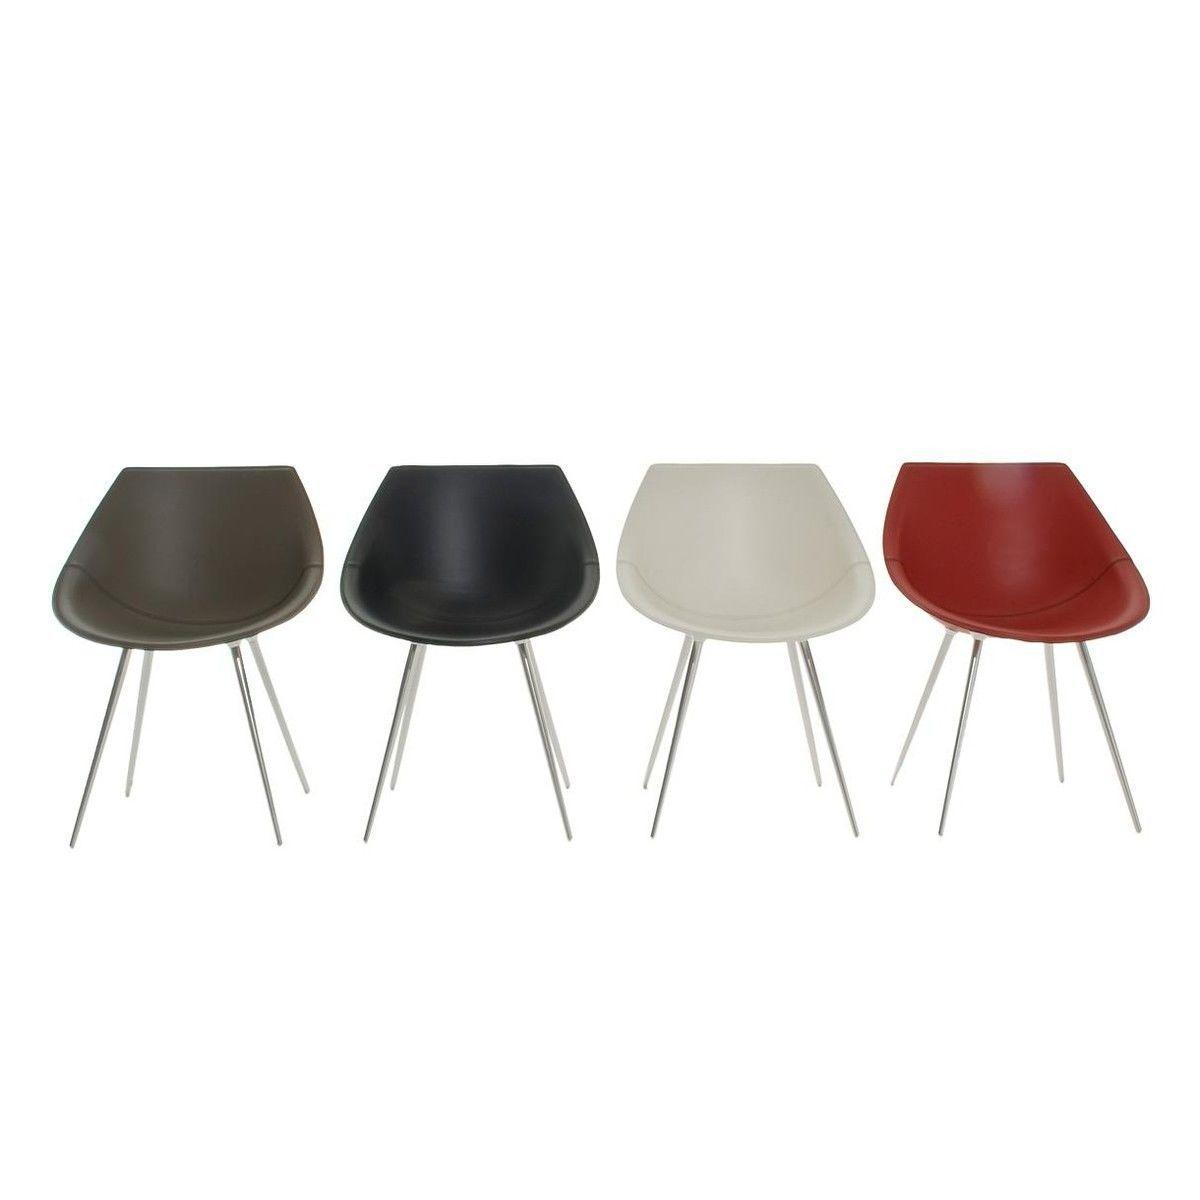 Lag silla con tapizado de cuero driade - Tapizado de silla ...